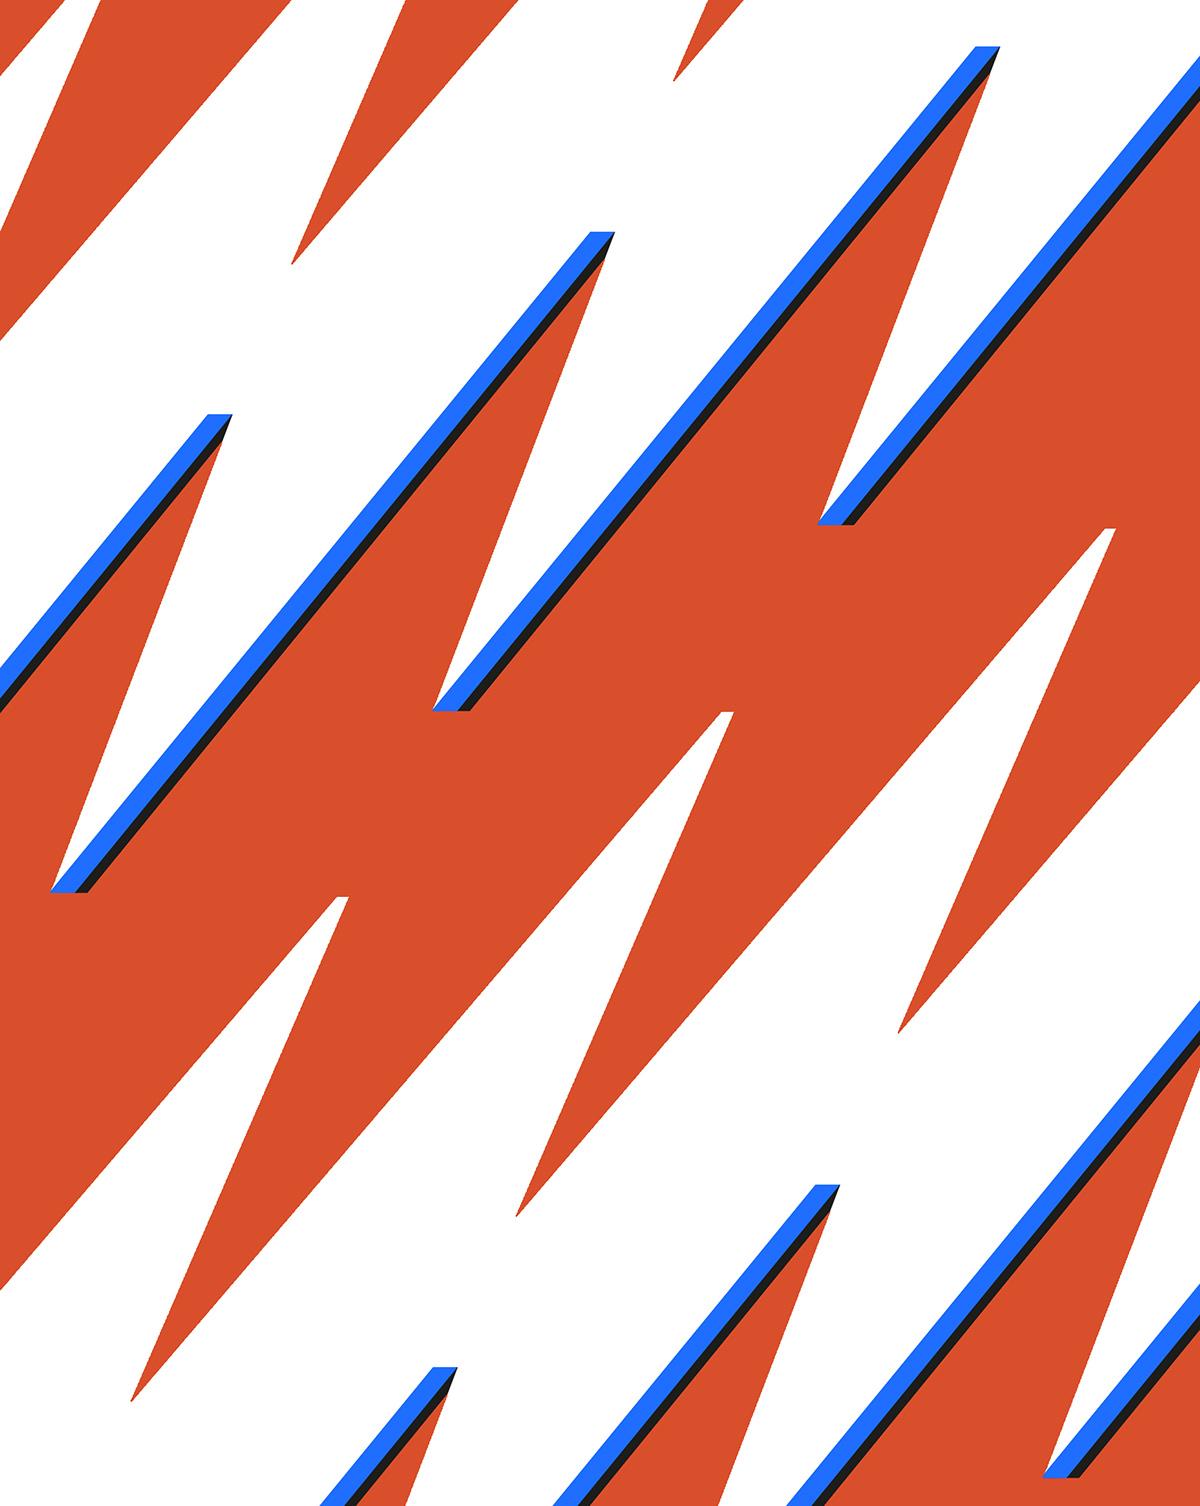 Thank you for watching!  sc 1 st  Behance & Lightning Bolt Pattern on Behance azcodes.com